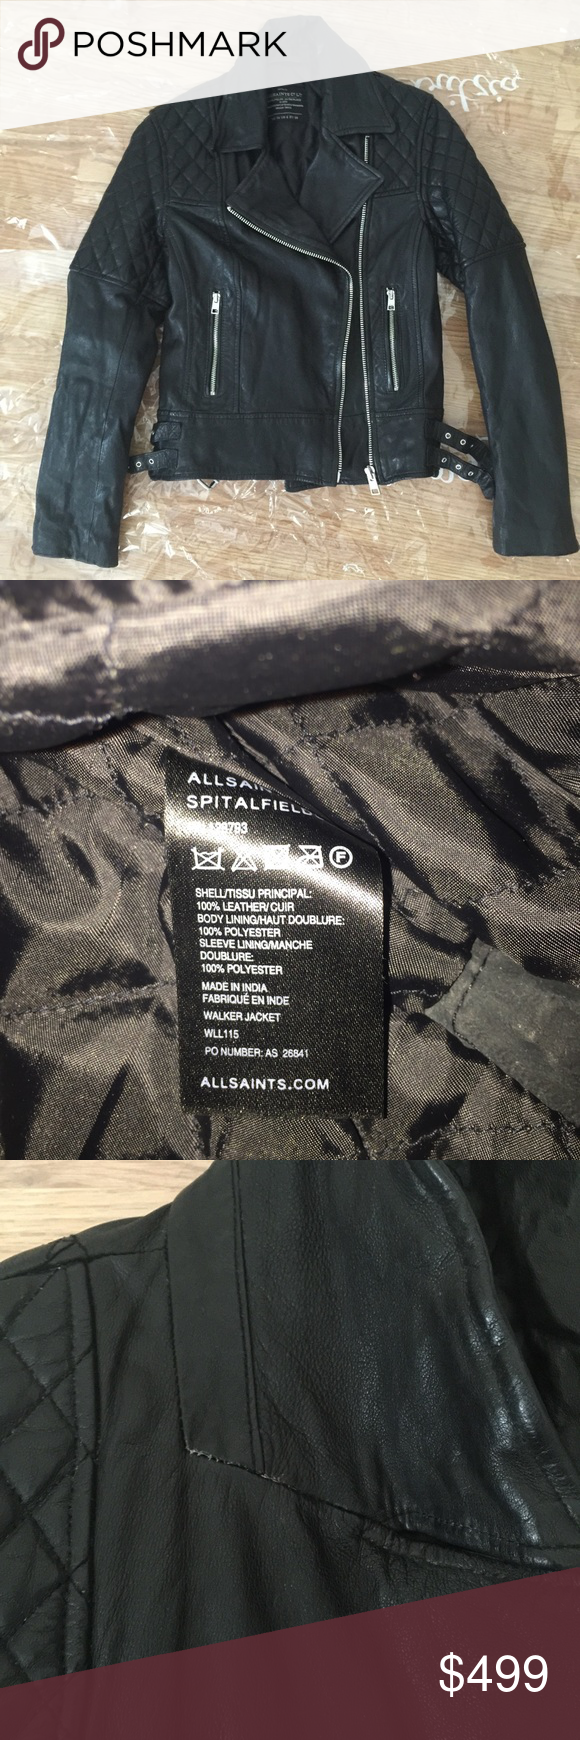 All Saints Spitalfields Walker Leather Jacket **Only wore